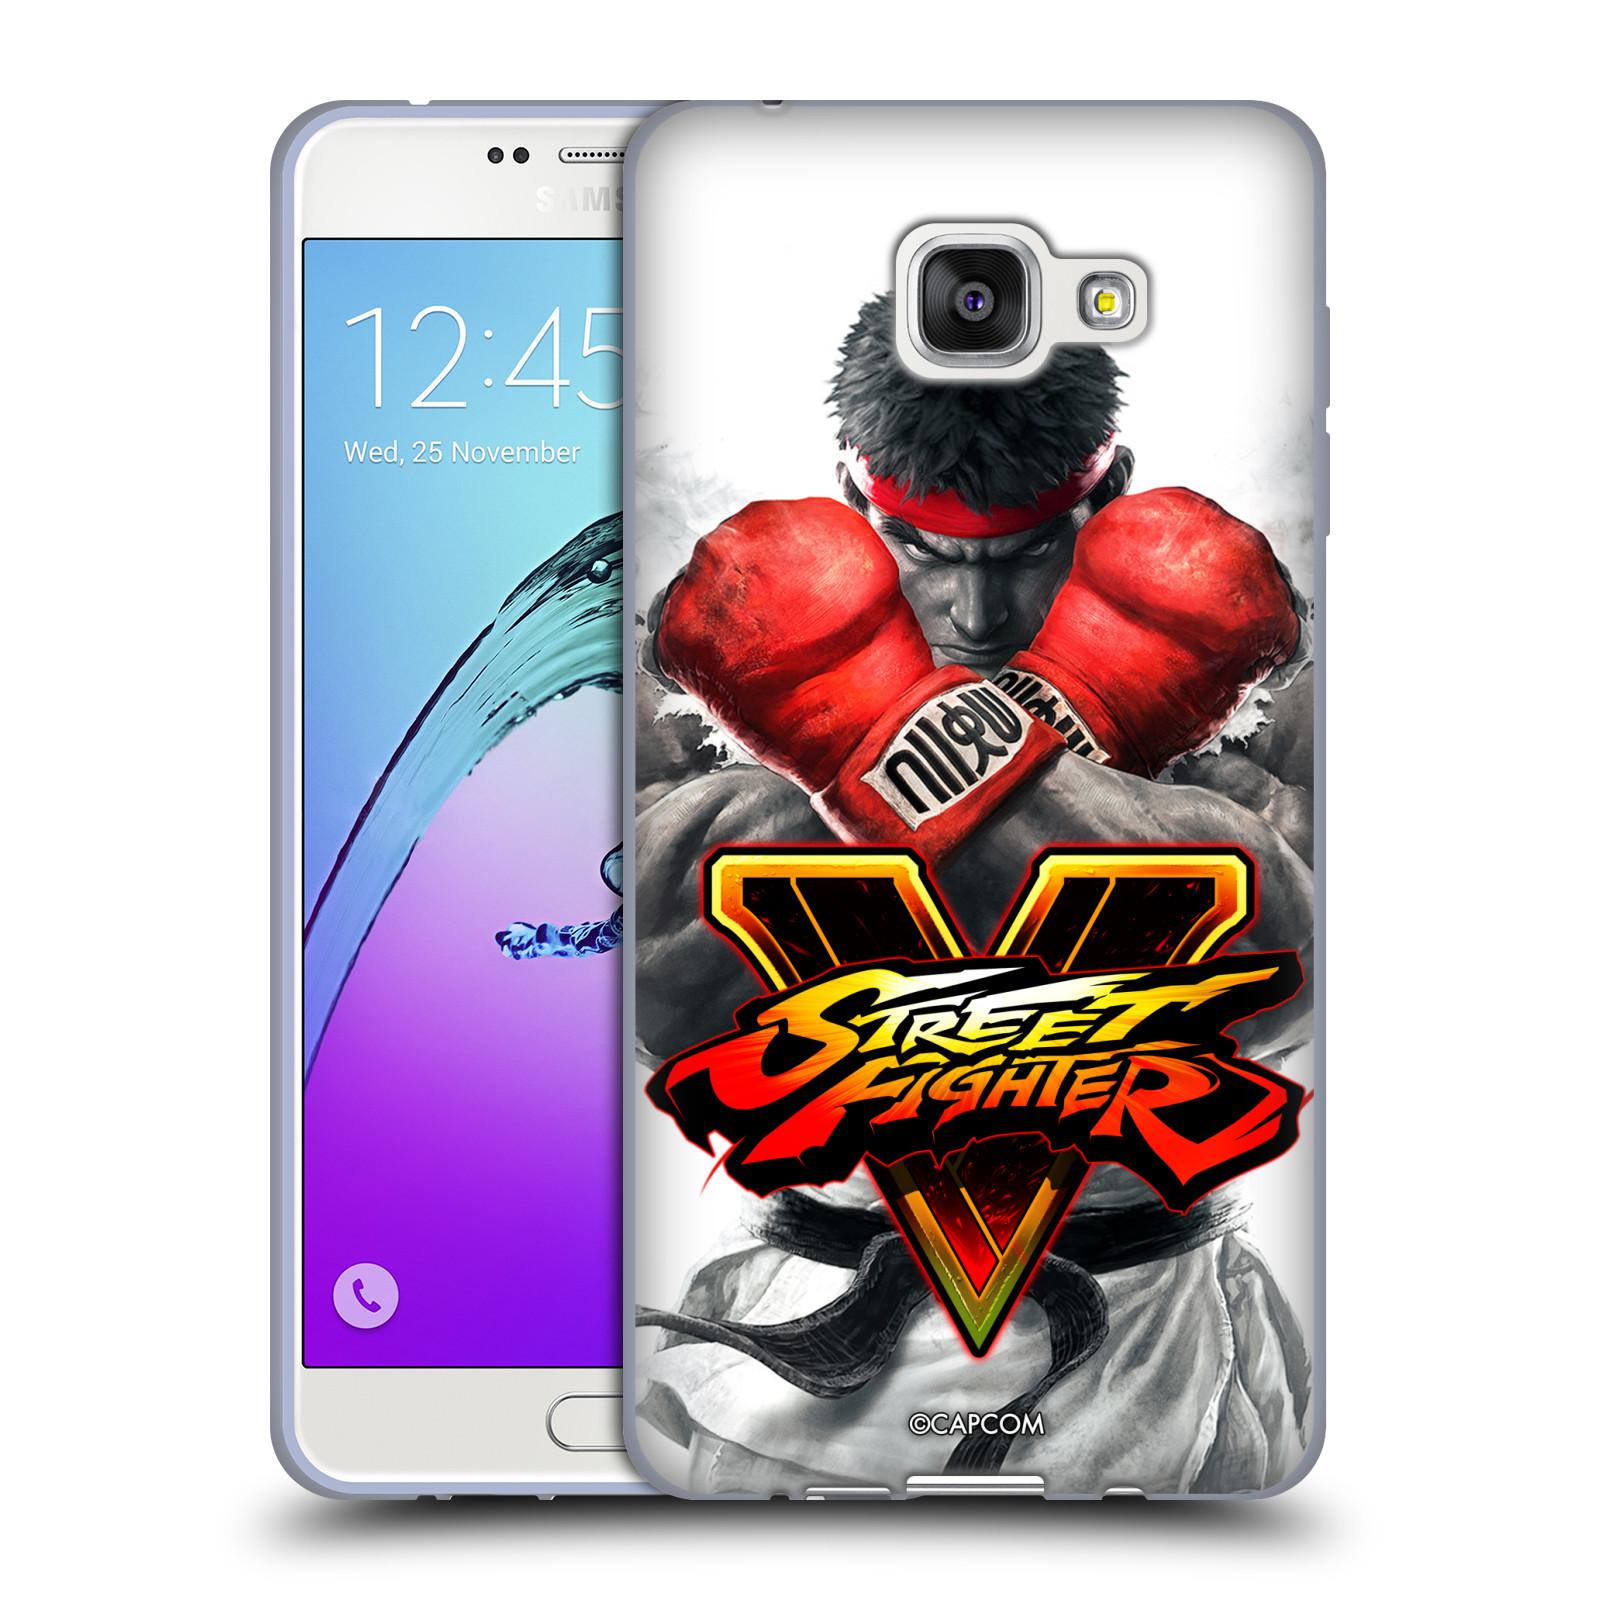 HEAD CASE silikonový obal na mobil Samsung Galaxy A7 2016 (A710) oficiální kryt STREET FIGHTER Boxer Ryu